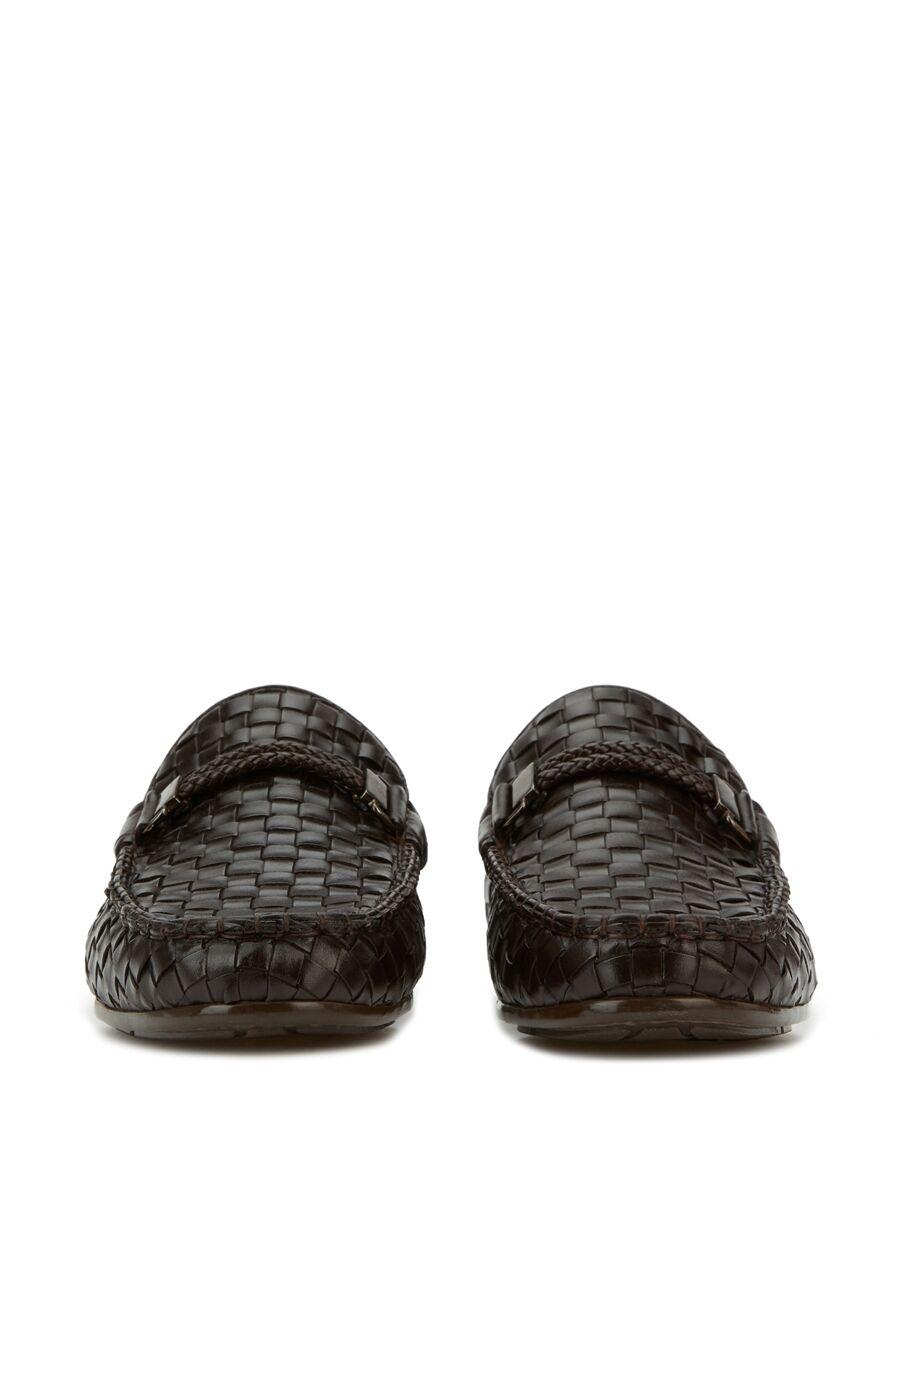 Kahverengi Örgü Dokulu Erkek Deri Loafer